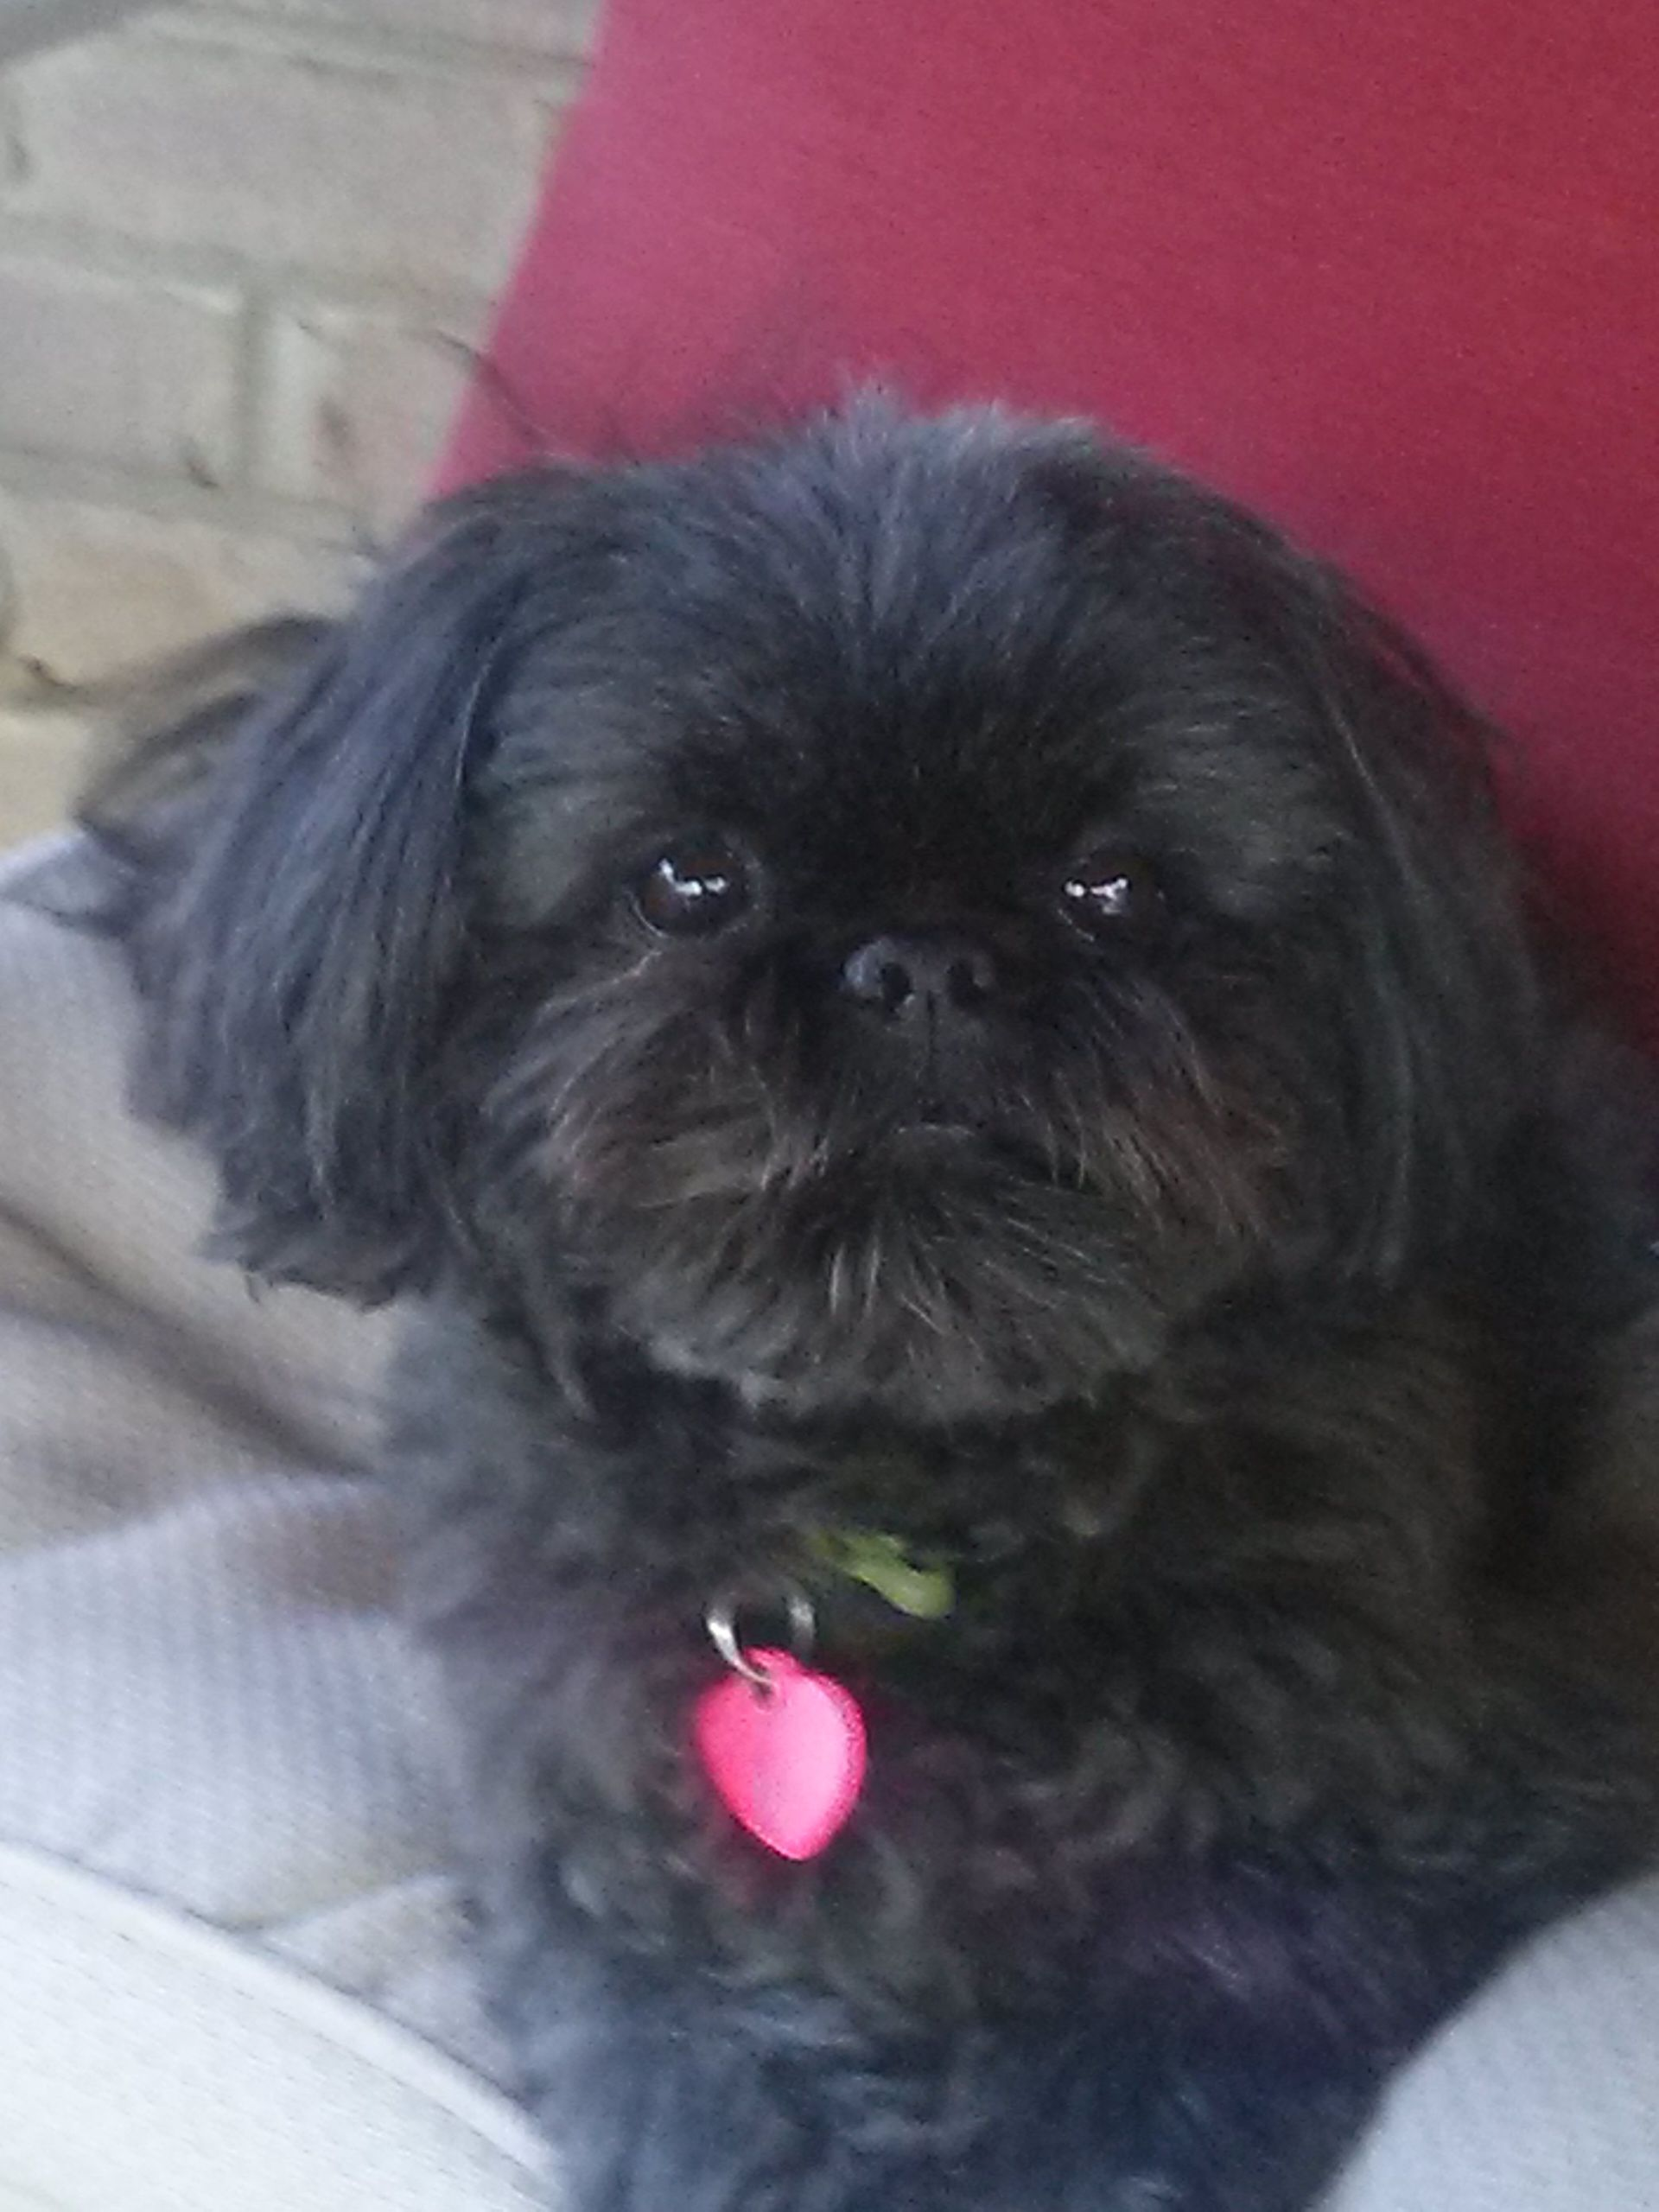 This black Shih Tzu looks just like mine. Shih tzu puppy